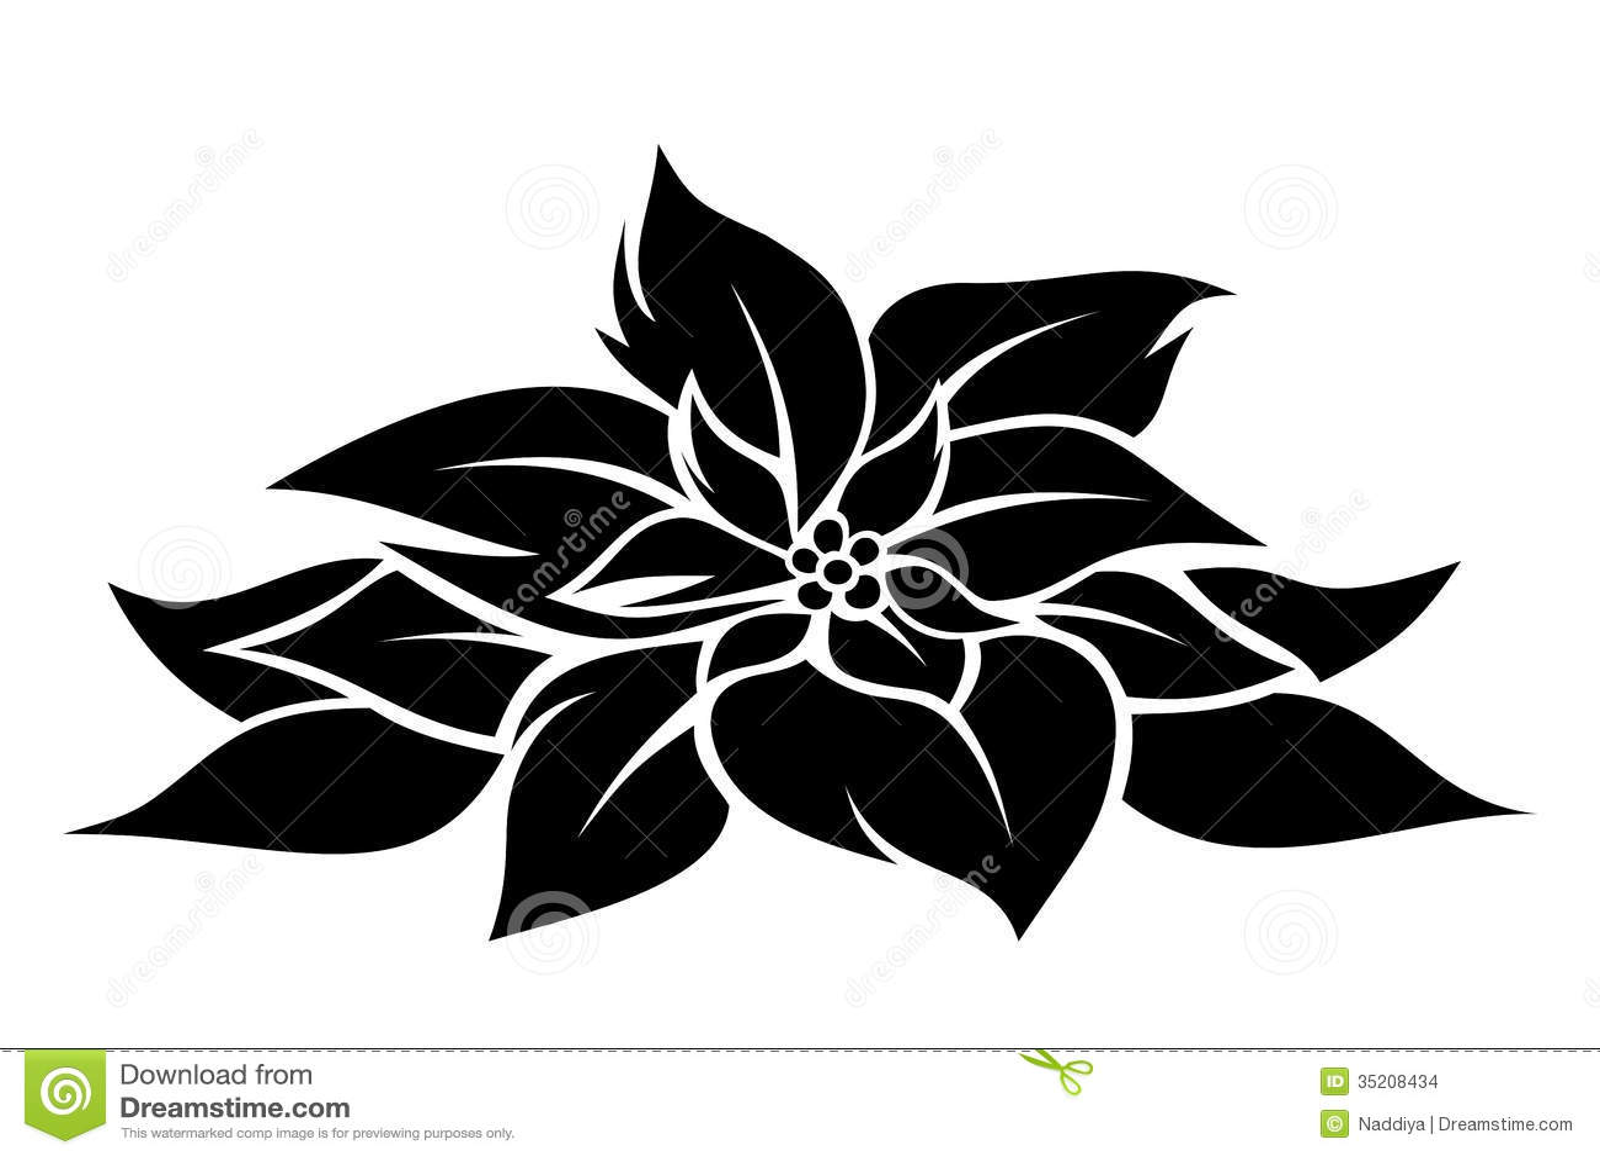 Poinsettia Clip Art Black And White | New Calendar Template Site